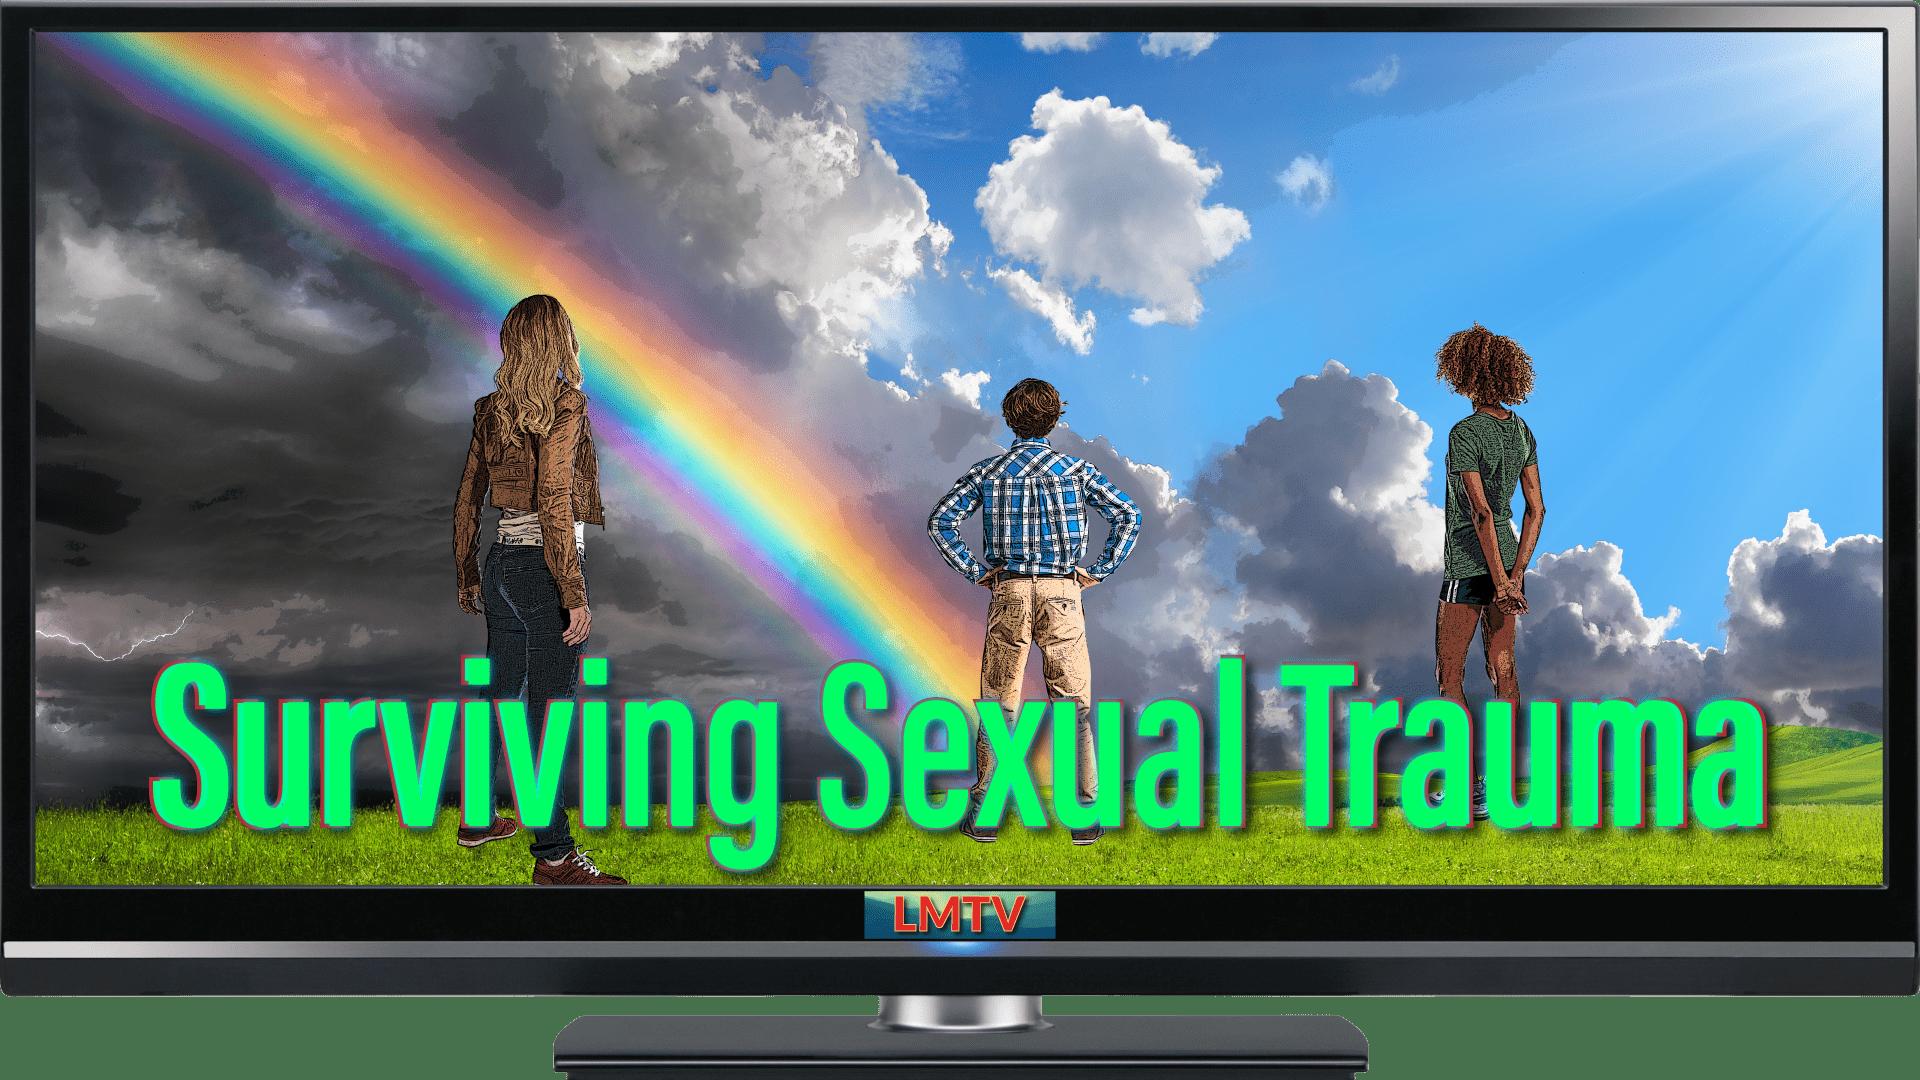 Surviving Sexual Trauma